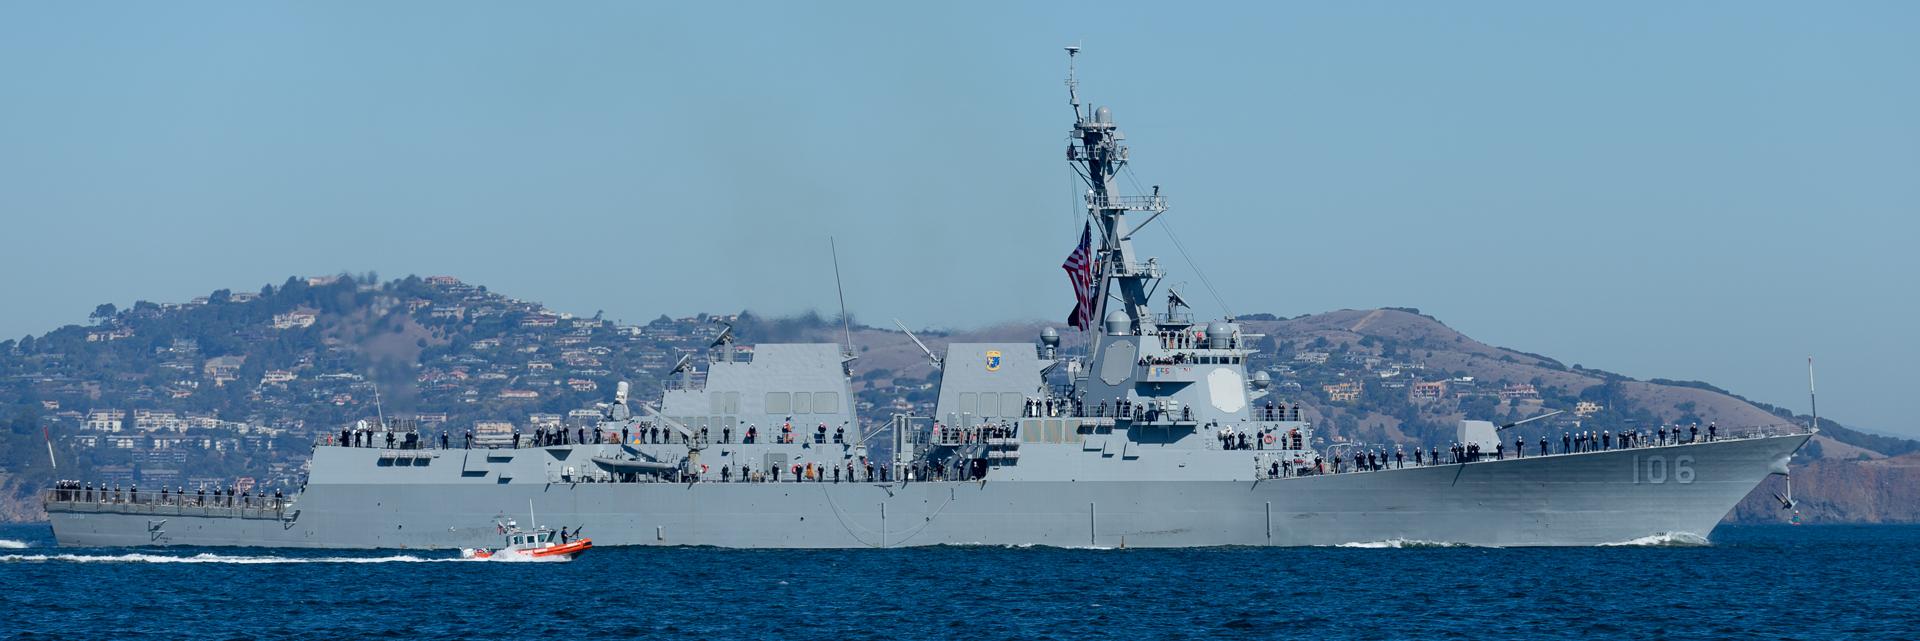 San Francisco Fleet Week / USS Stockdale